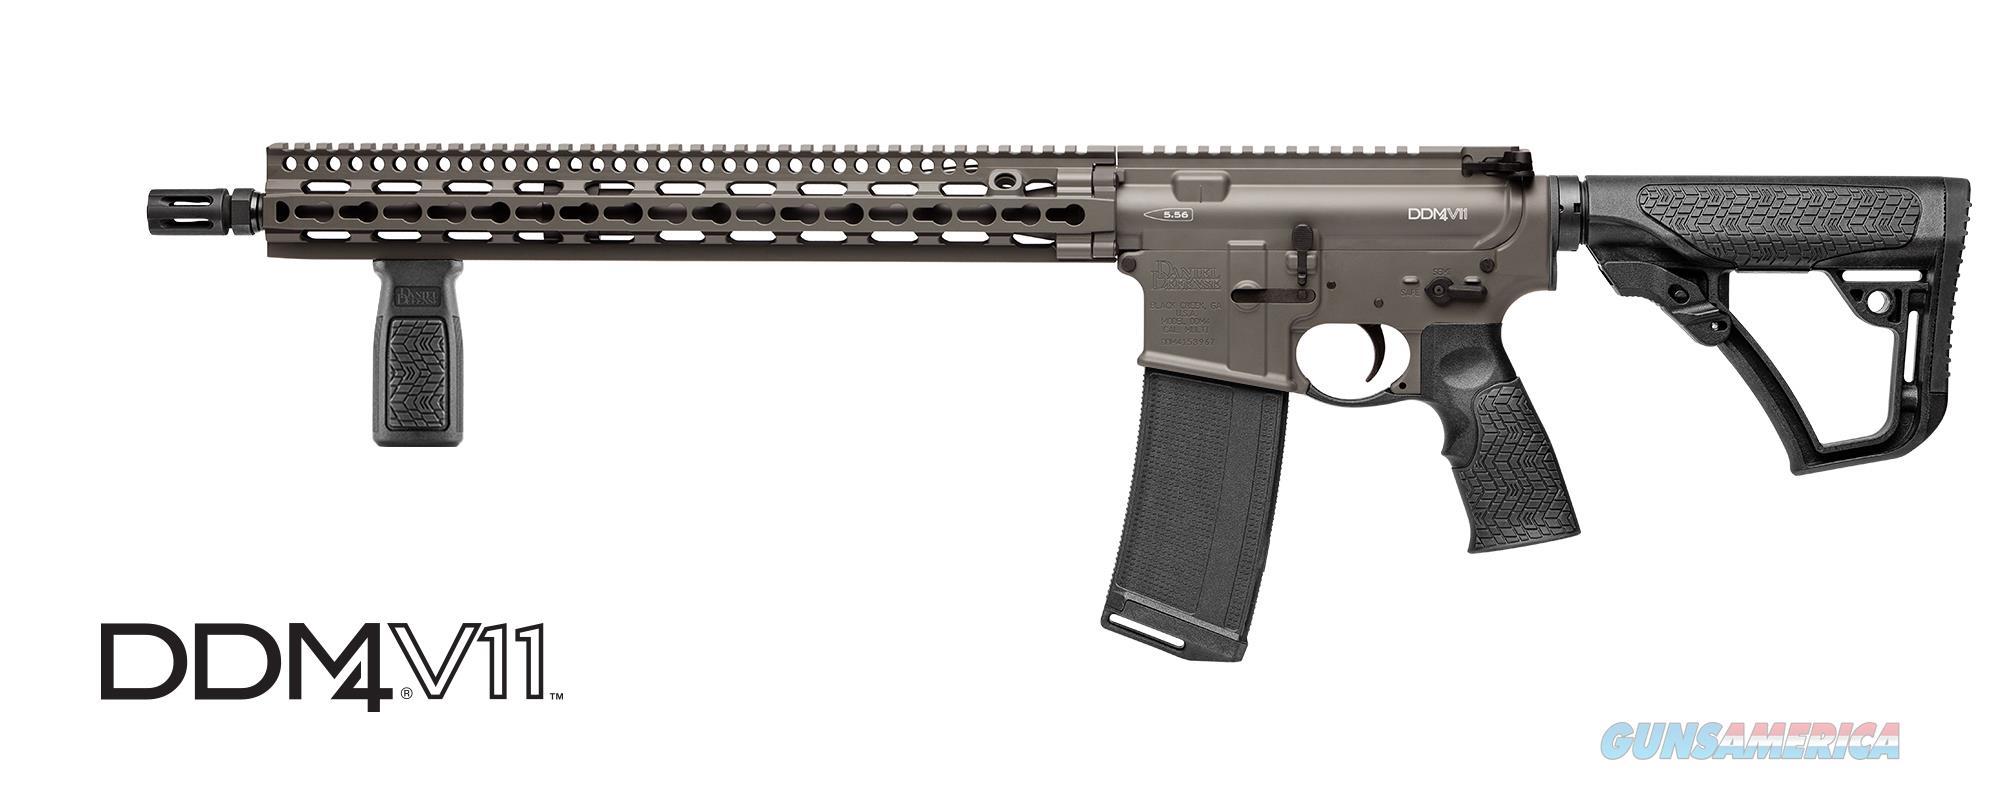 "Daniel Defense M4 V11 16"" DEEPWOODS Cerakote 02-151-10240-047  Guns > Rifles > Daniel Defense > Complete Rifles"